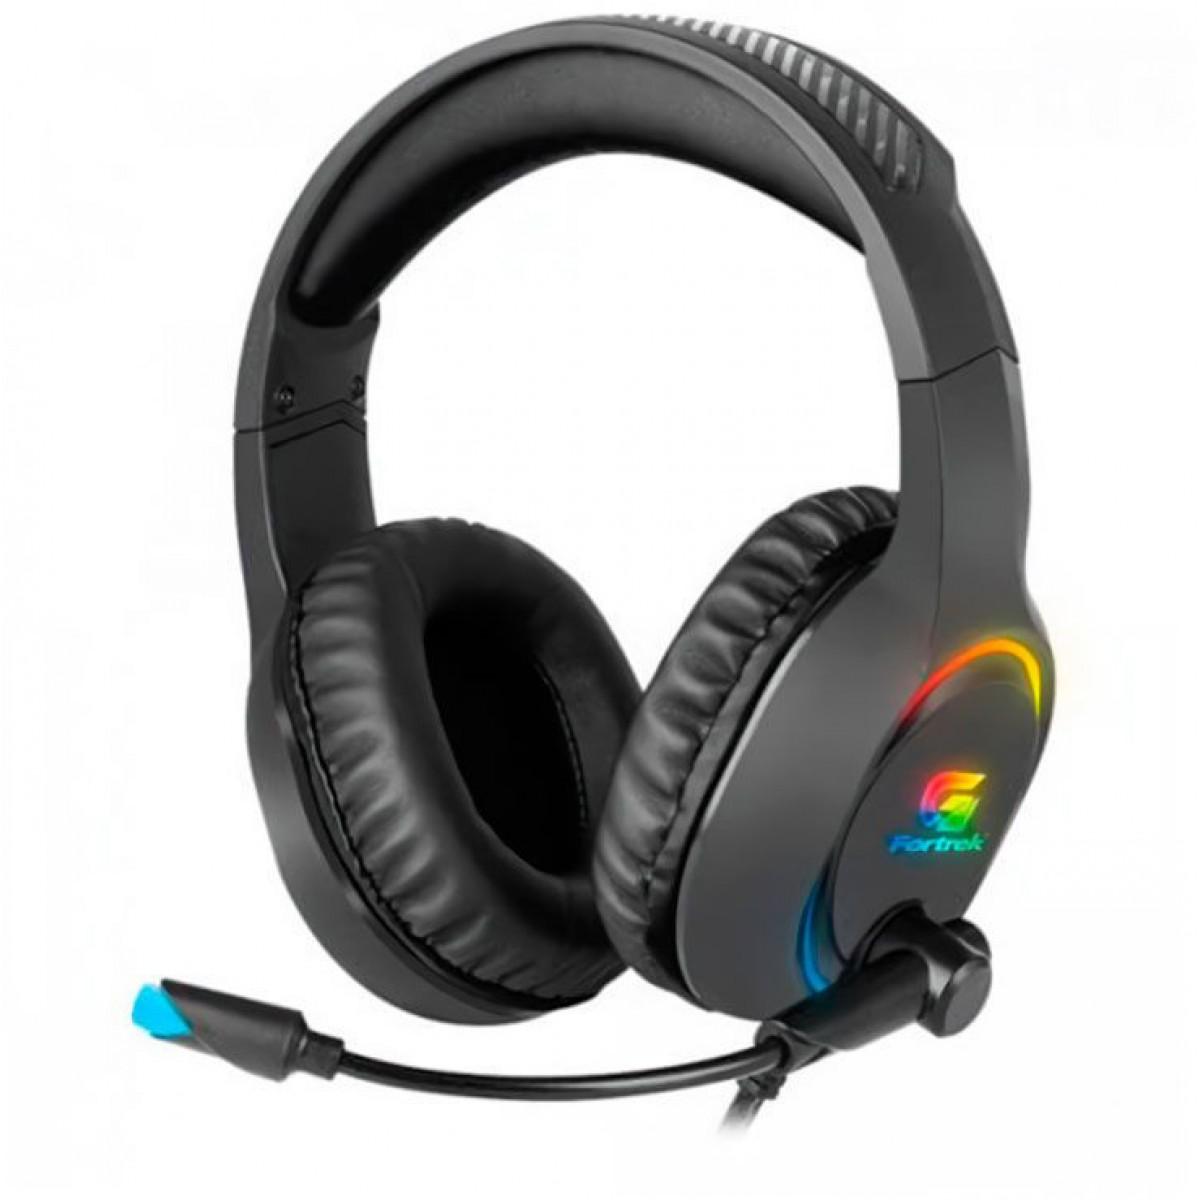 Headset Gamer Fortrek Holt, RGB, USB, Preto, 70552